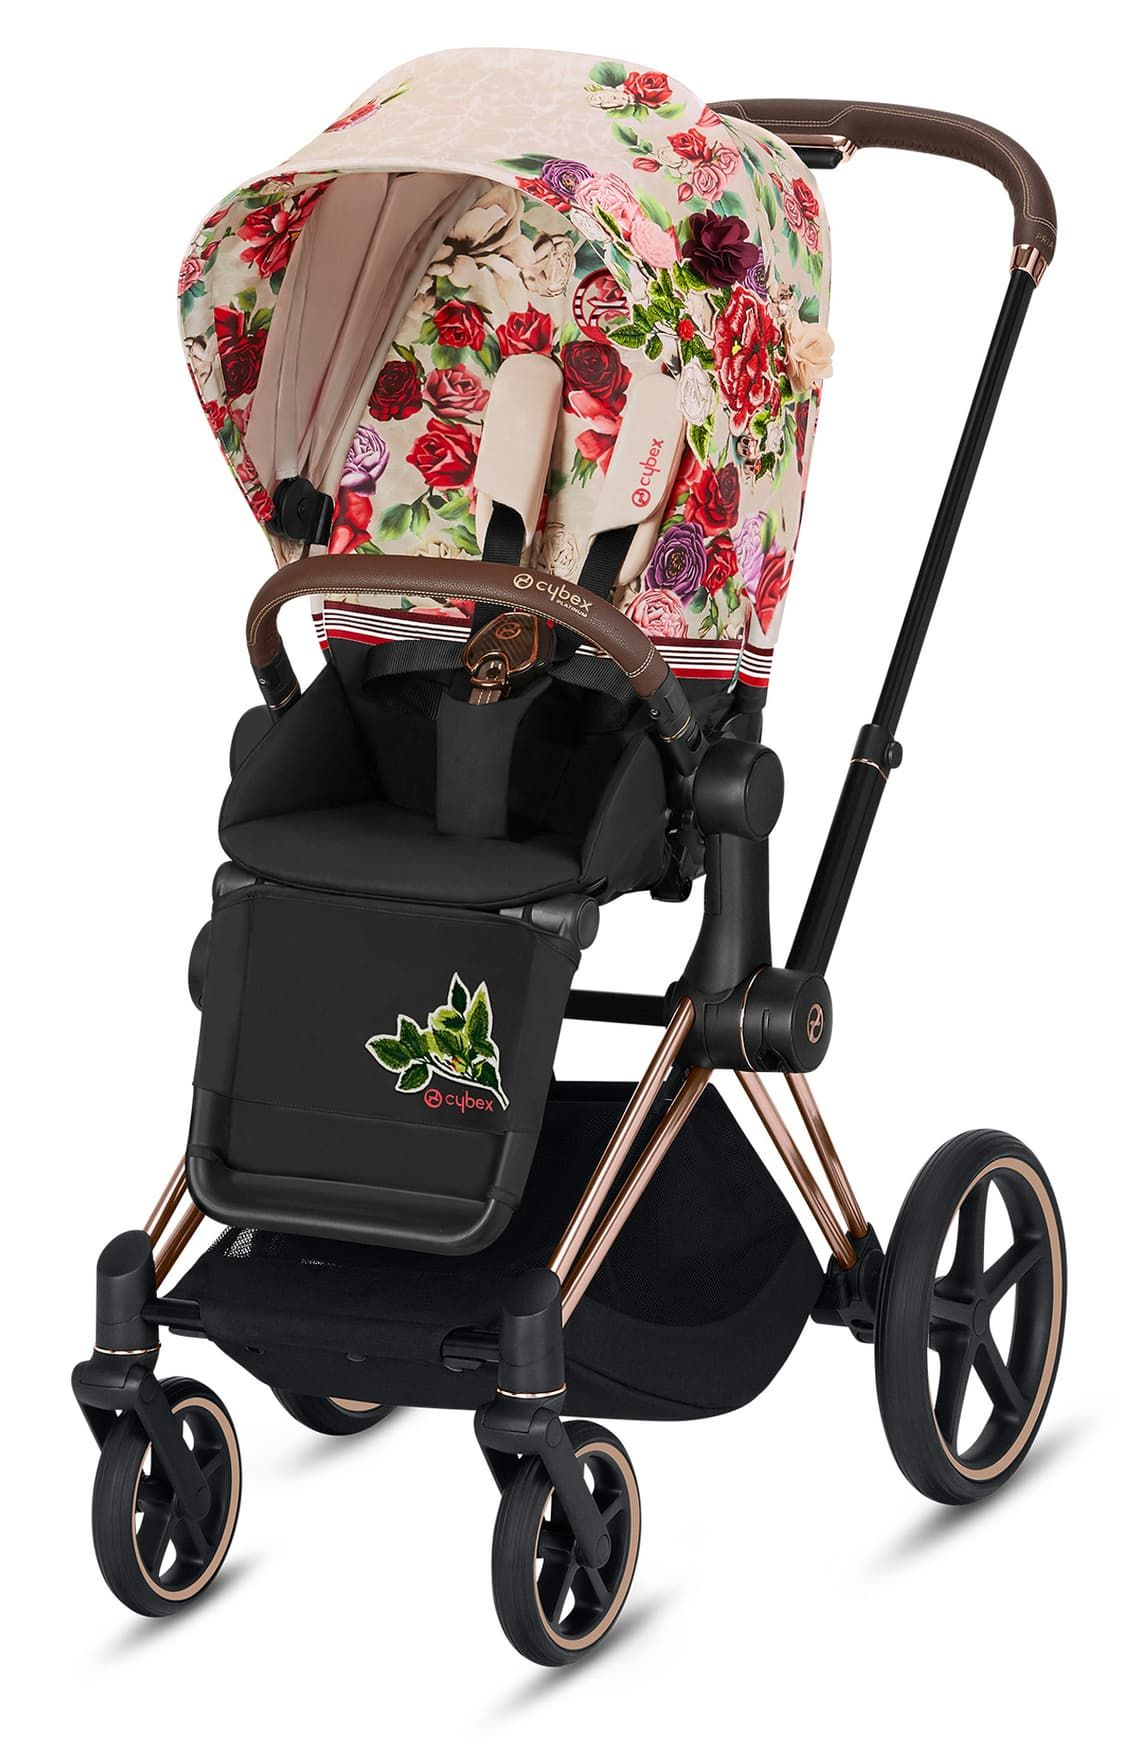 Cybex seat design pack for priam stroller nordstrom in